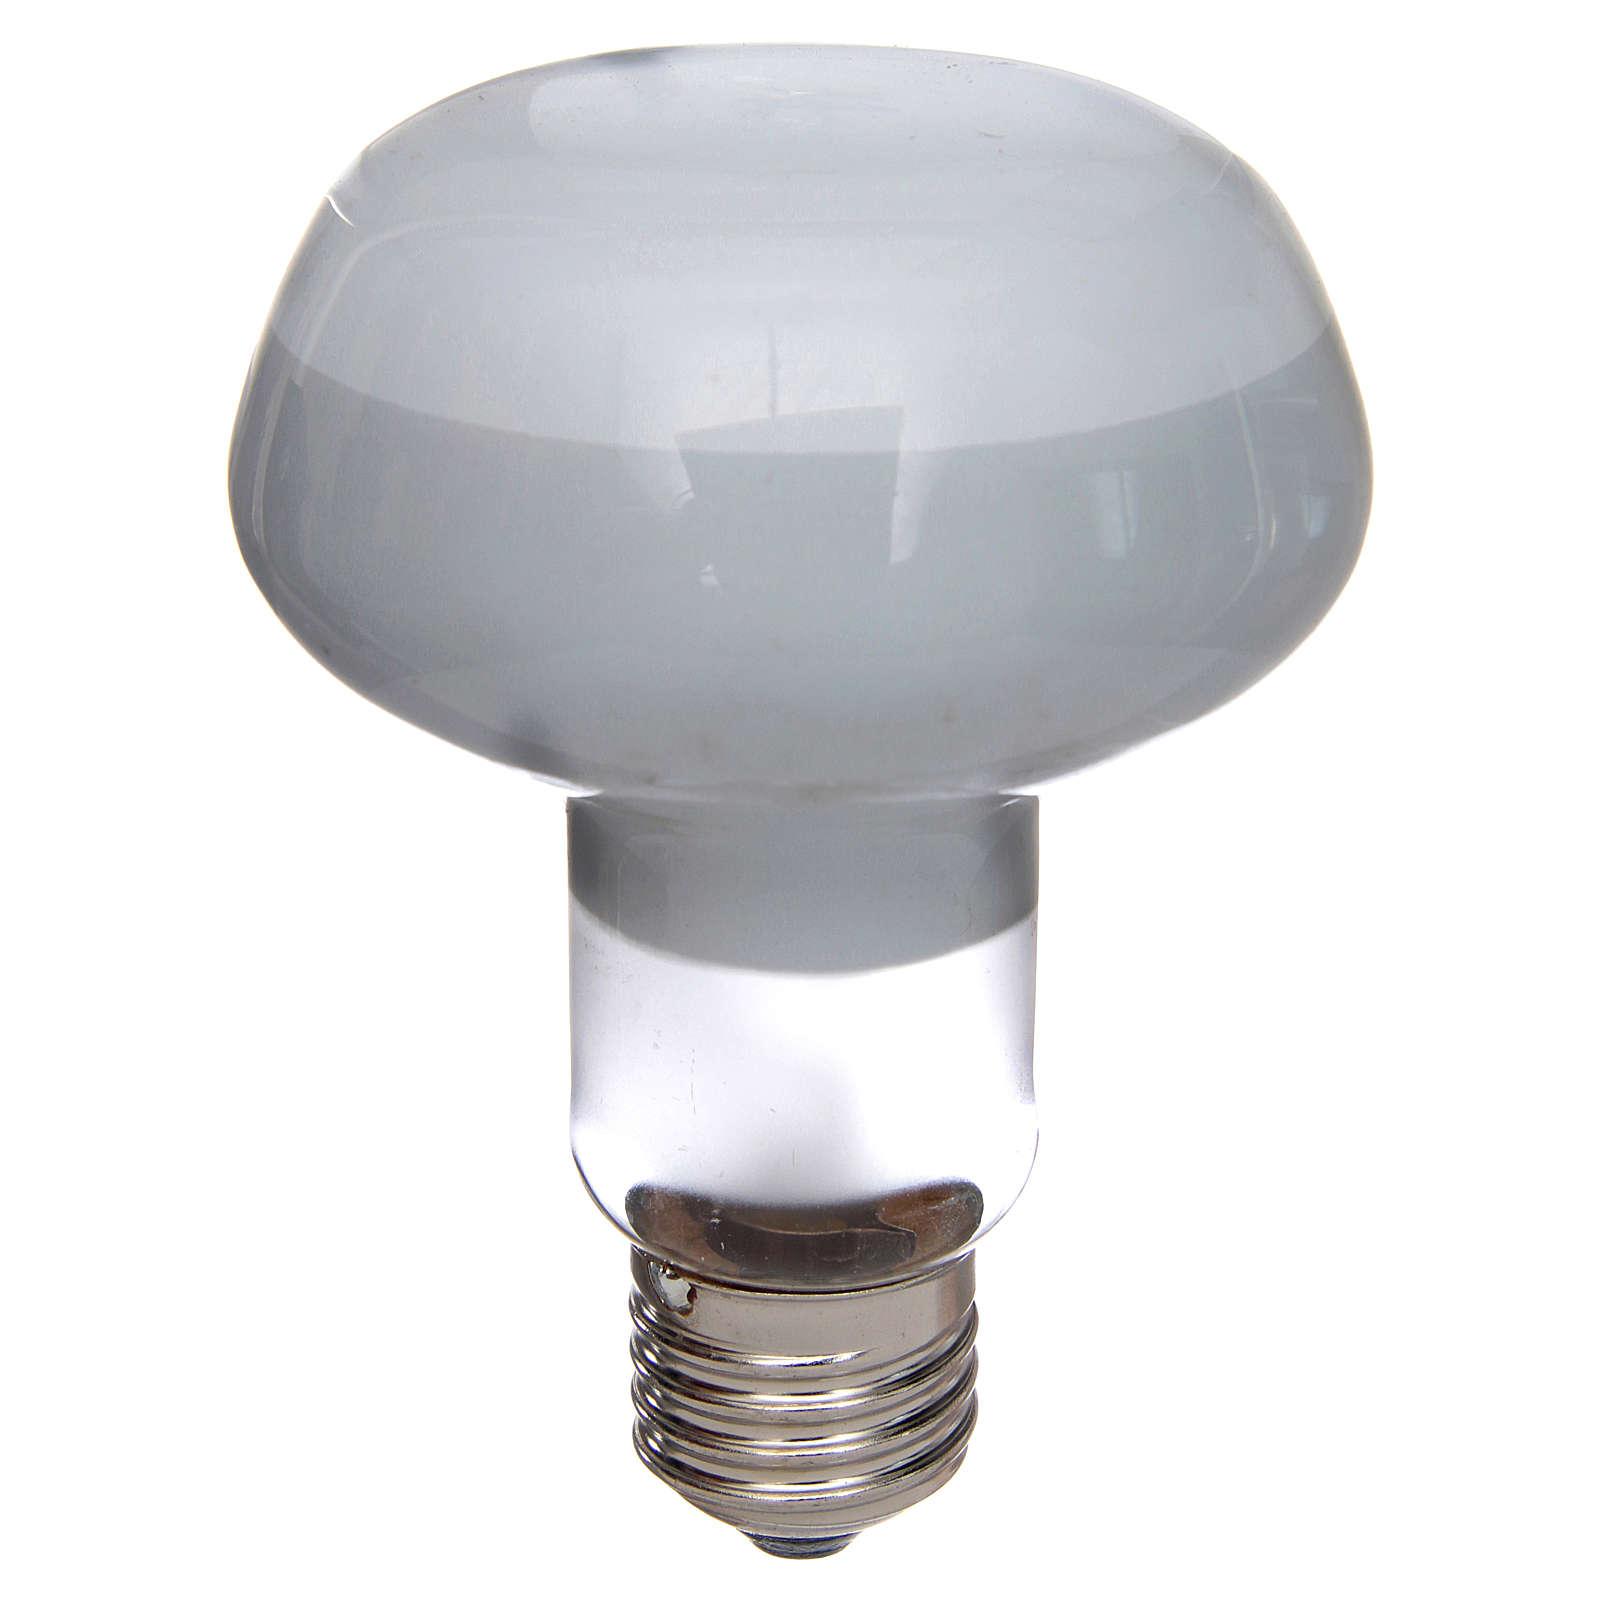 White lamp for nativity lighting, wide beam angle 80°, E27 4